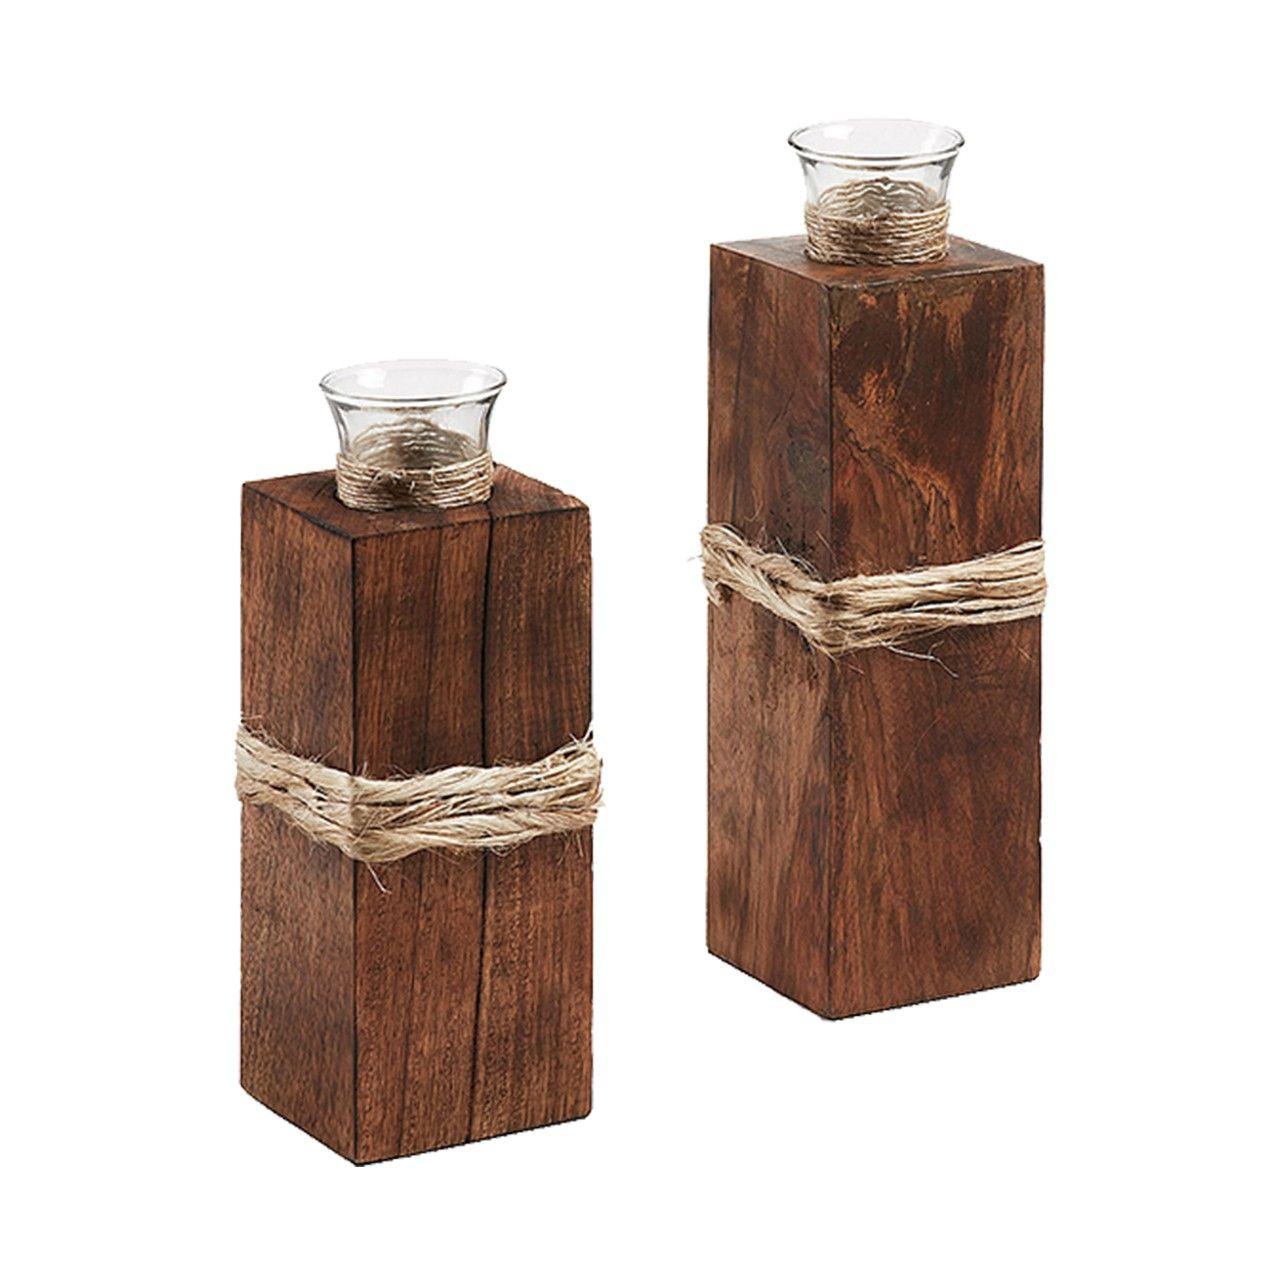 CasaJame Juego de 2 candelabros de madera de teca 6 x 8 cm